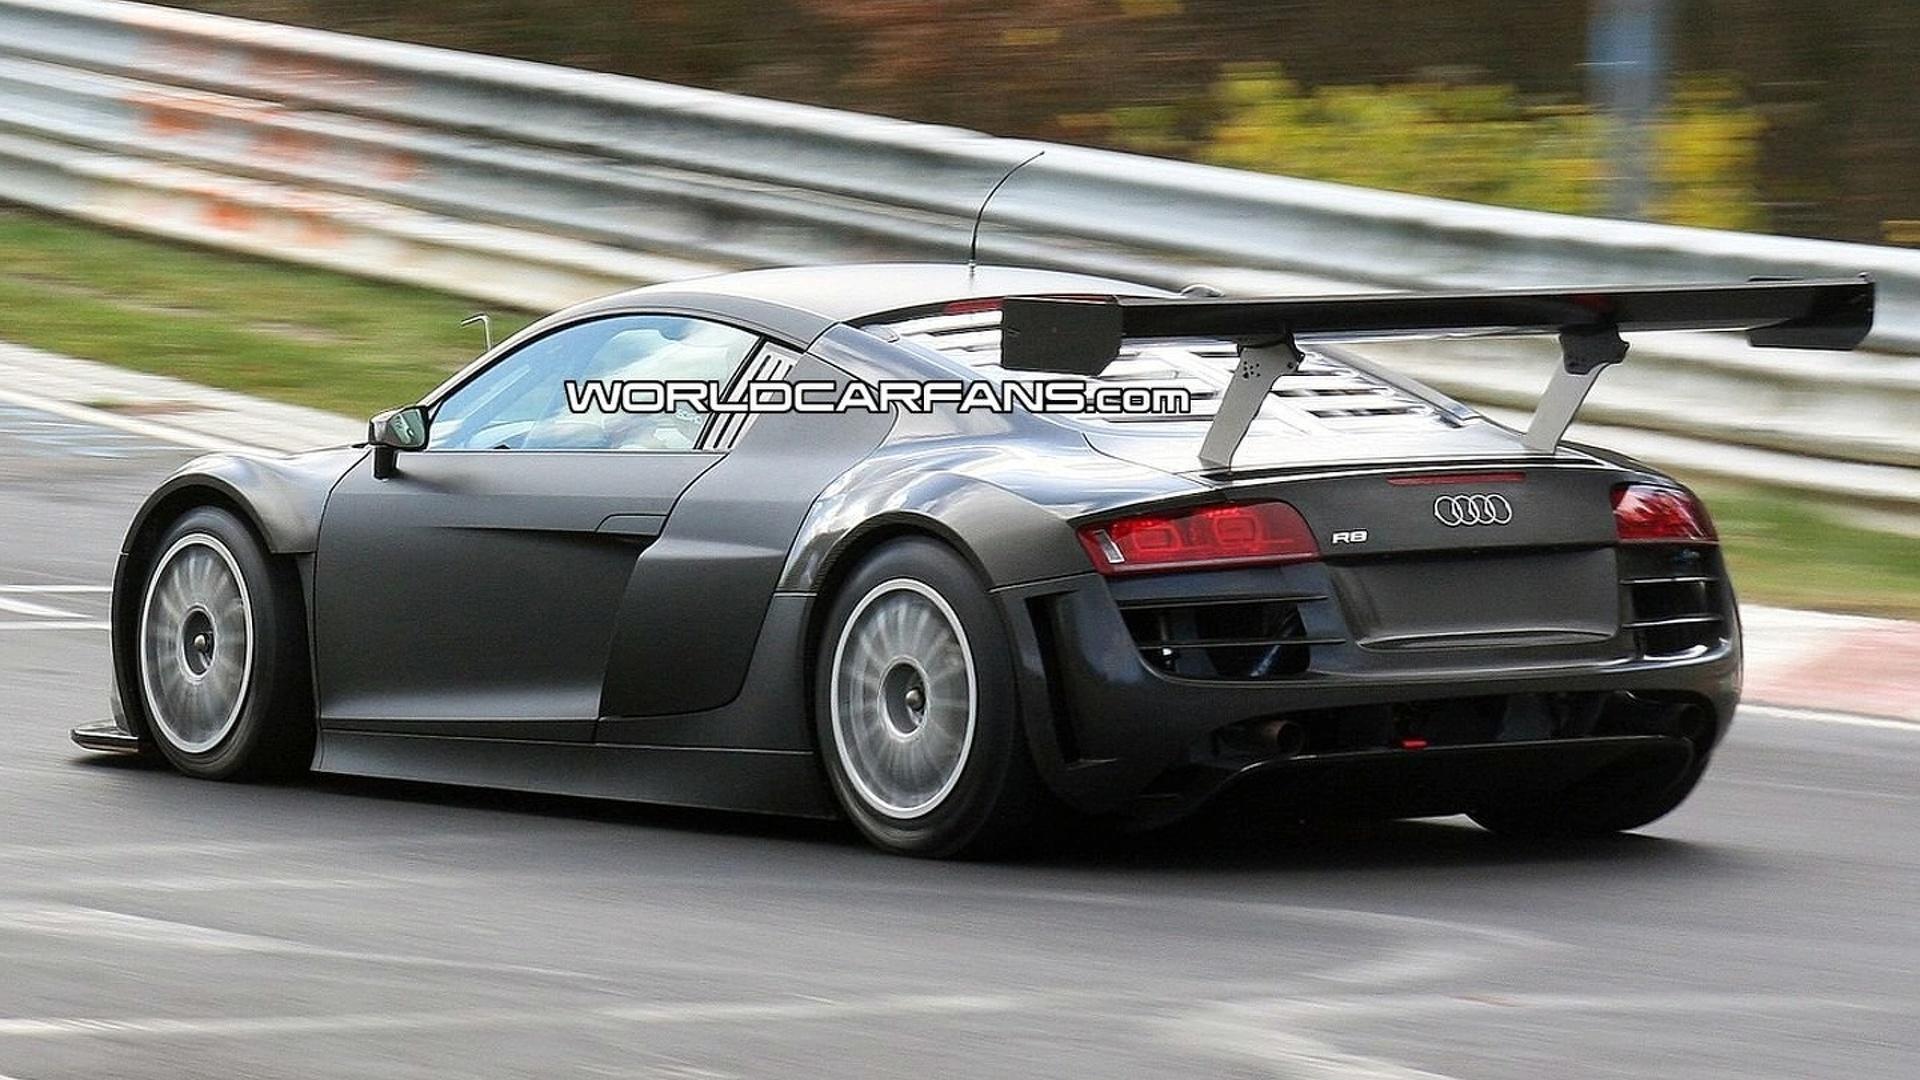 Audi r8 gt3 spied at nrburgring publicscrutiny Images